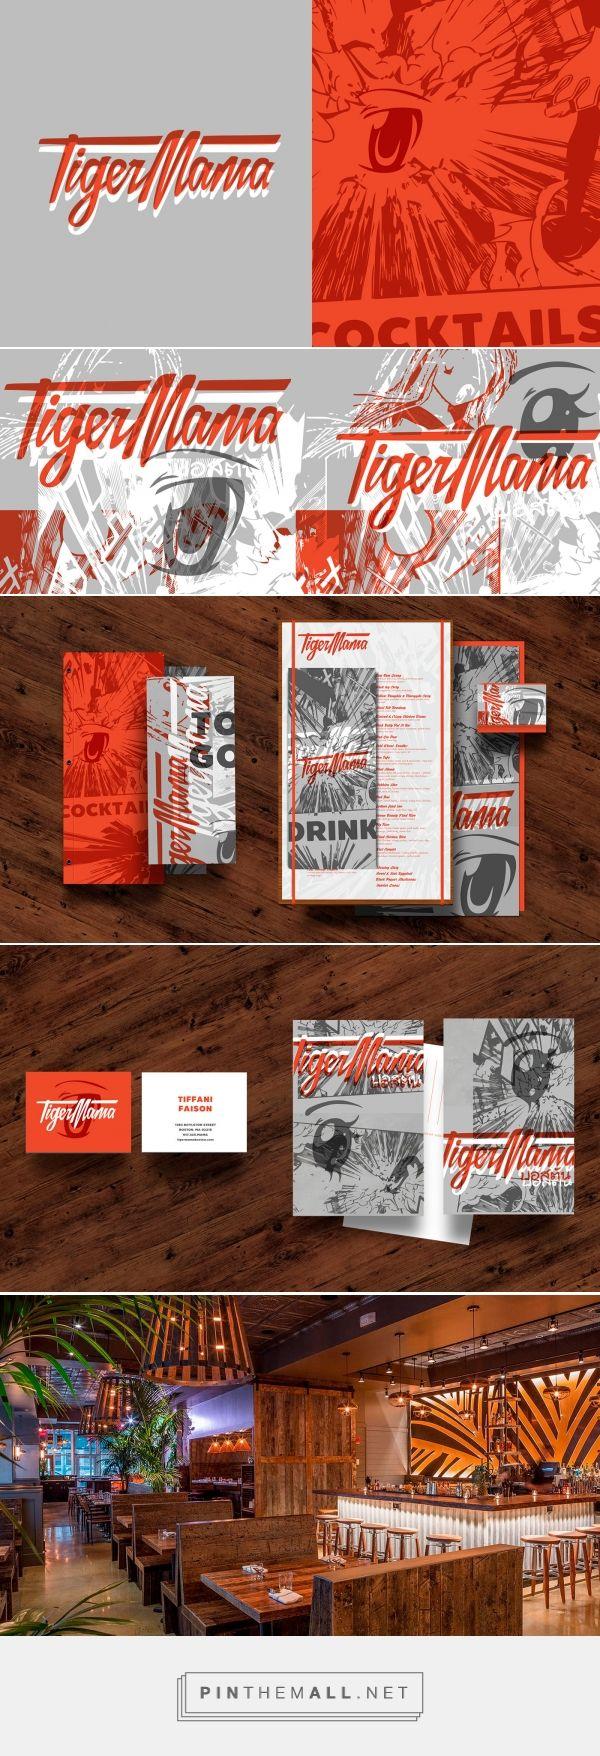 Brand Identity for Tiger Mama Restaurant, Boston, MA on Behance - created via https://pinthemall.net